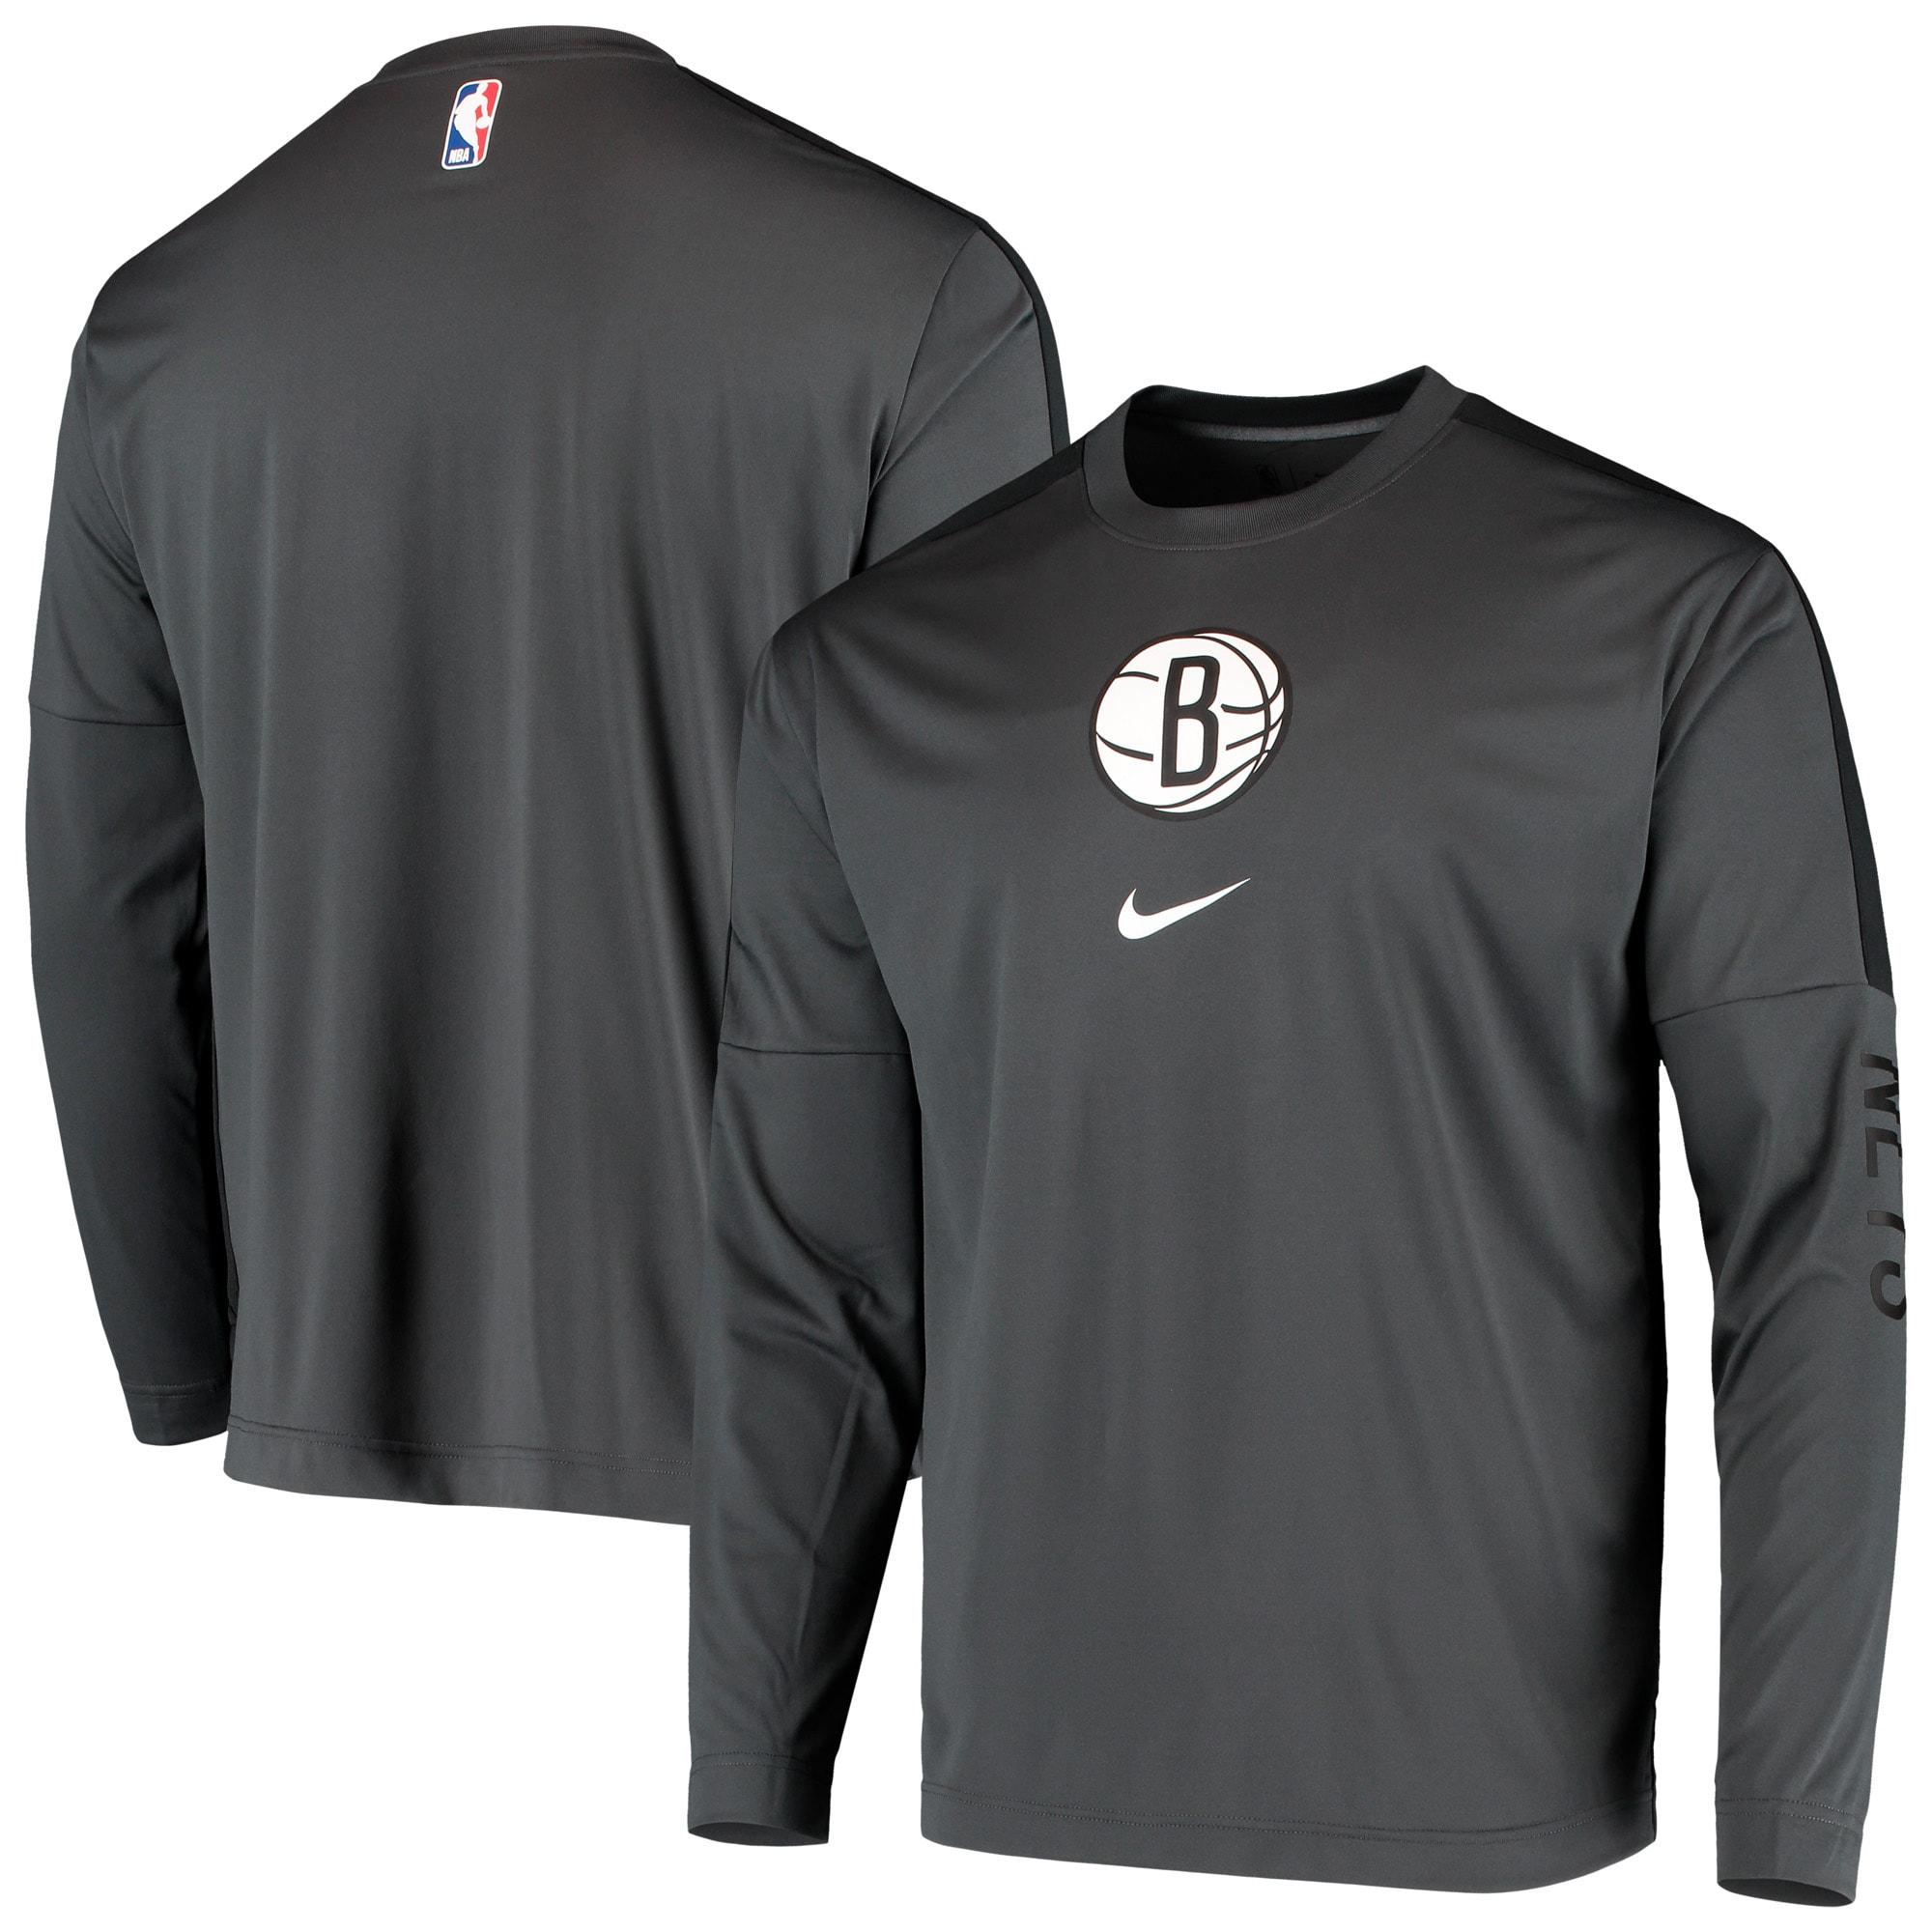 Brooklyn Nets Nike Long Sleeve Shooting Performance Shirt - Charcoal